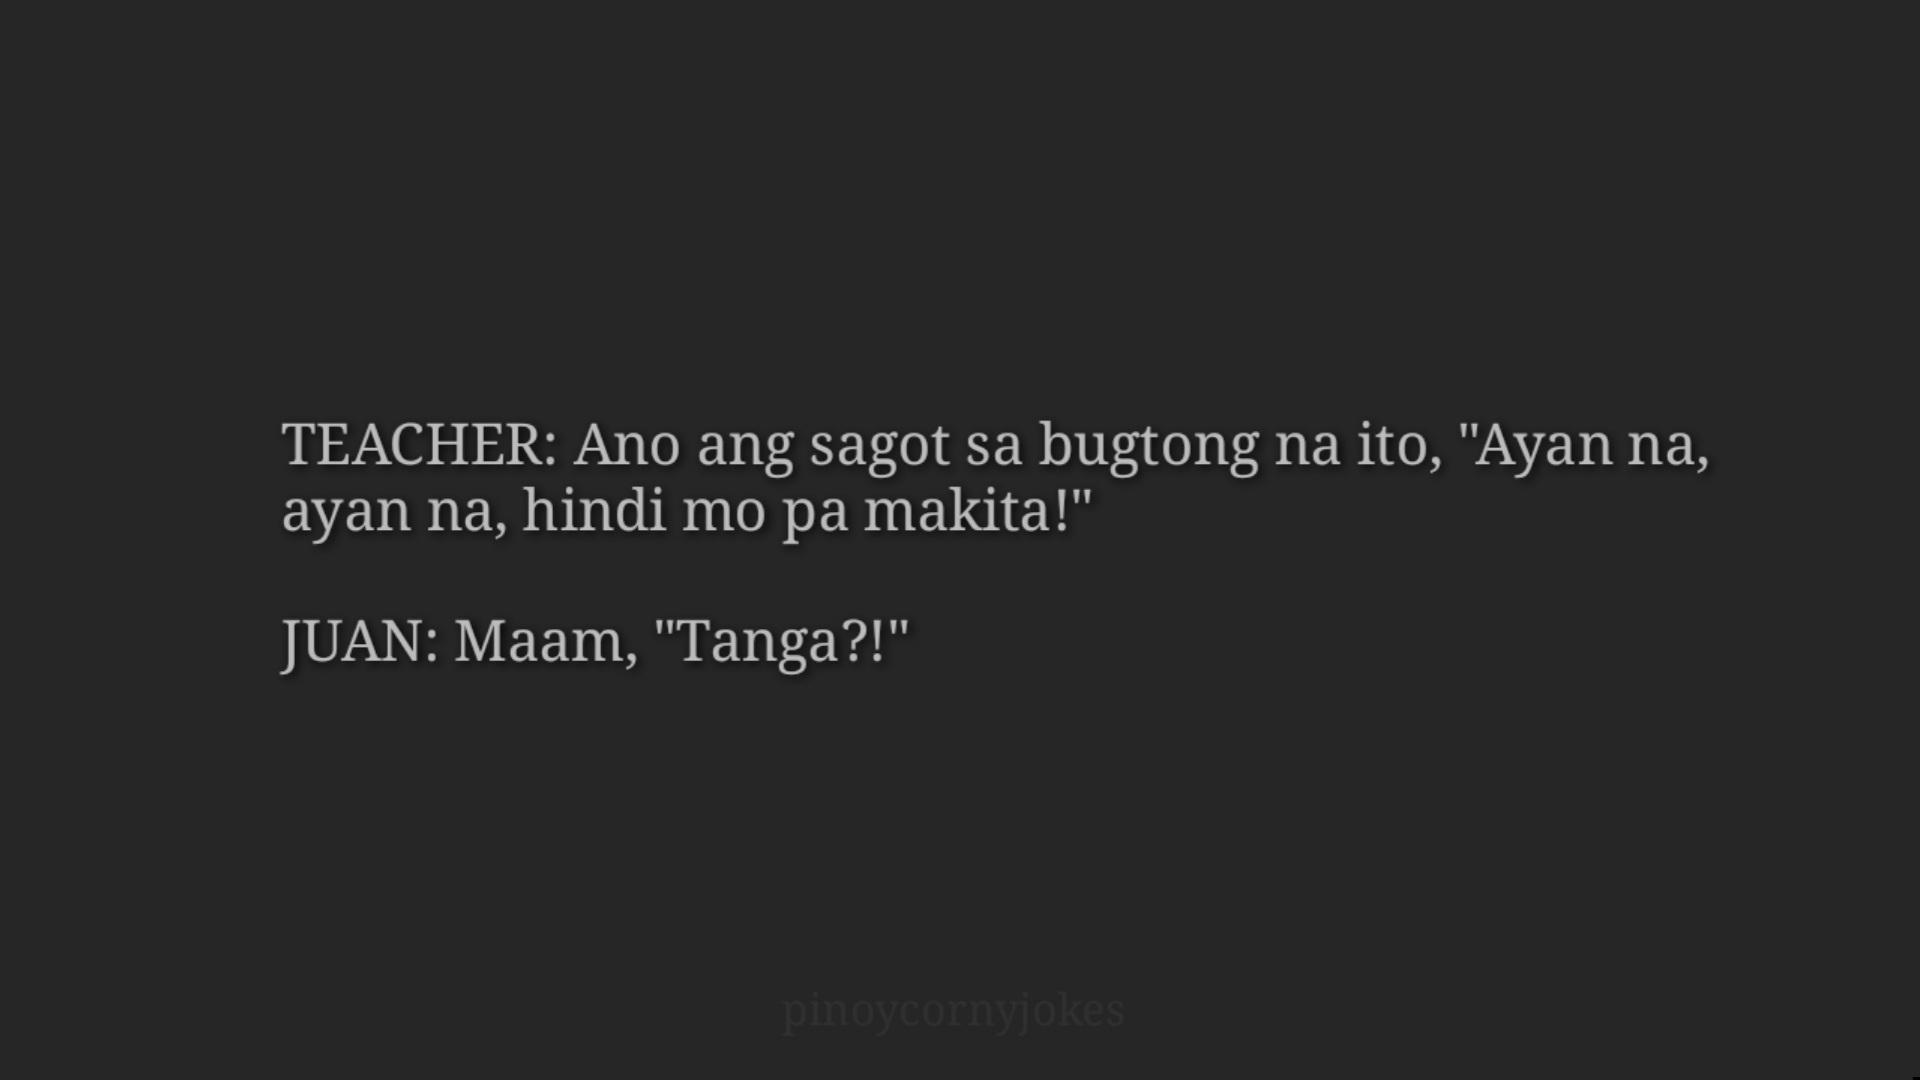 Bugtong Para kay Juan Tagalog Jokes